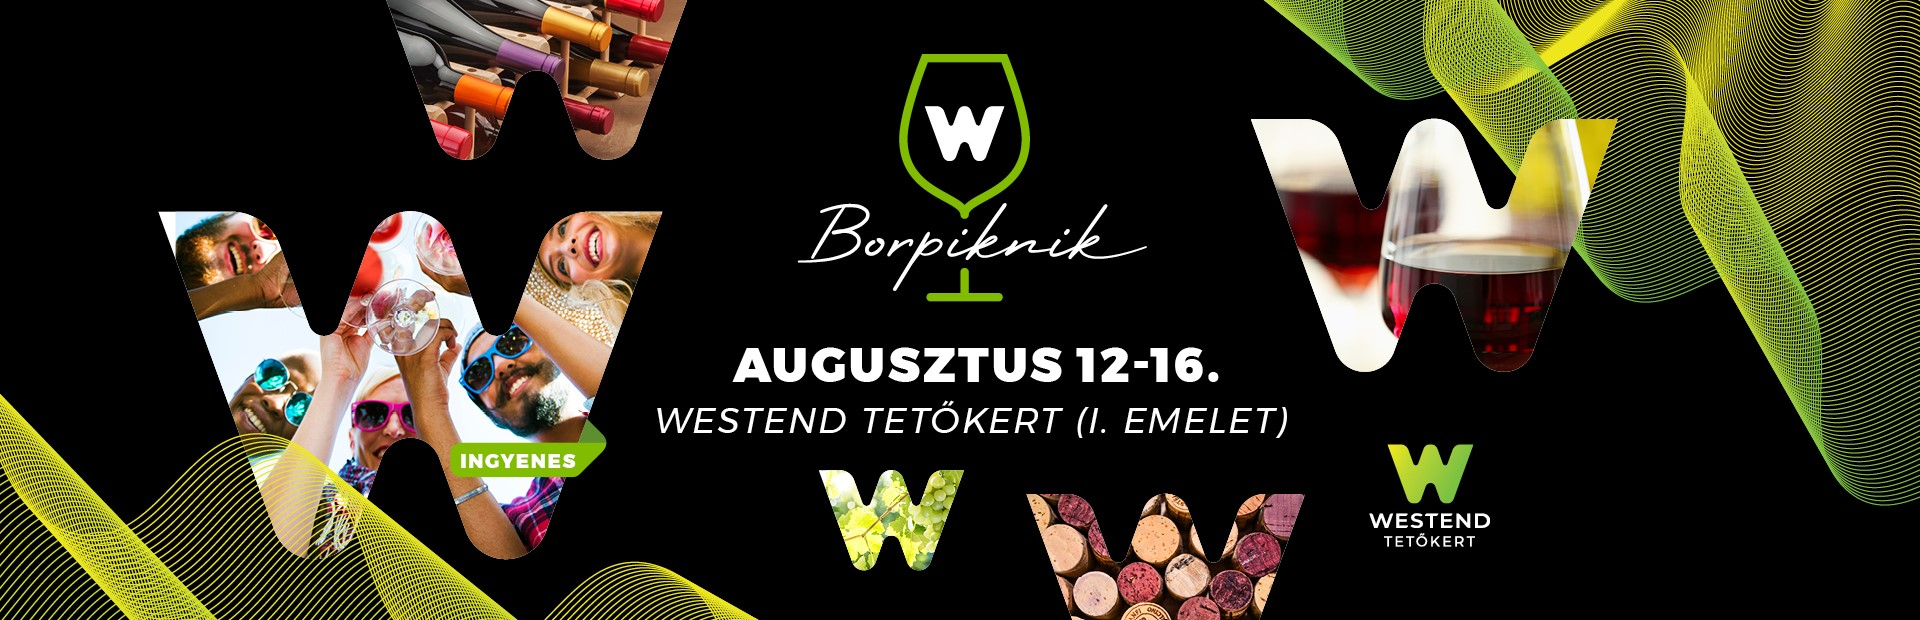 Westend Borpiknik - augusztus 12-16.